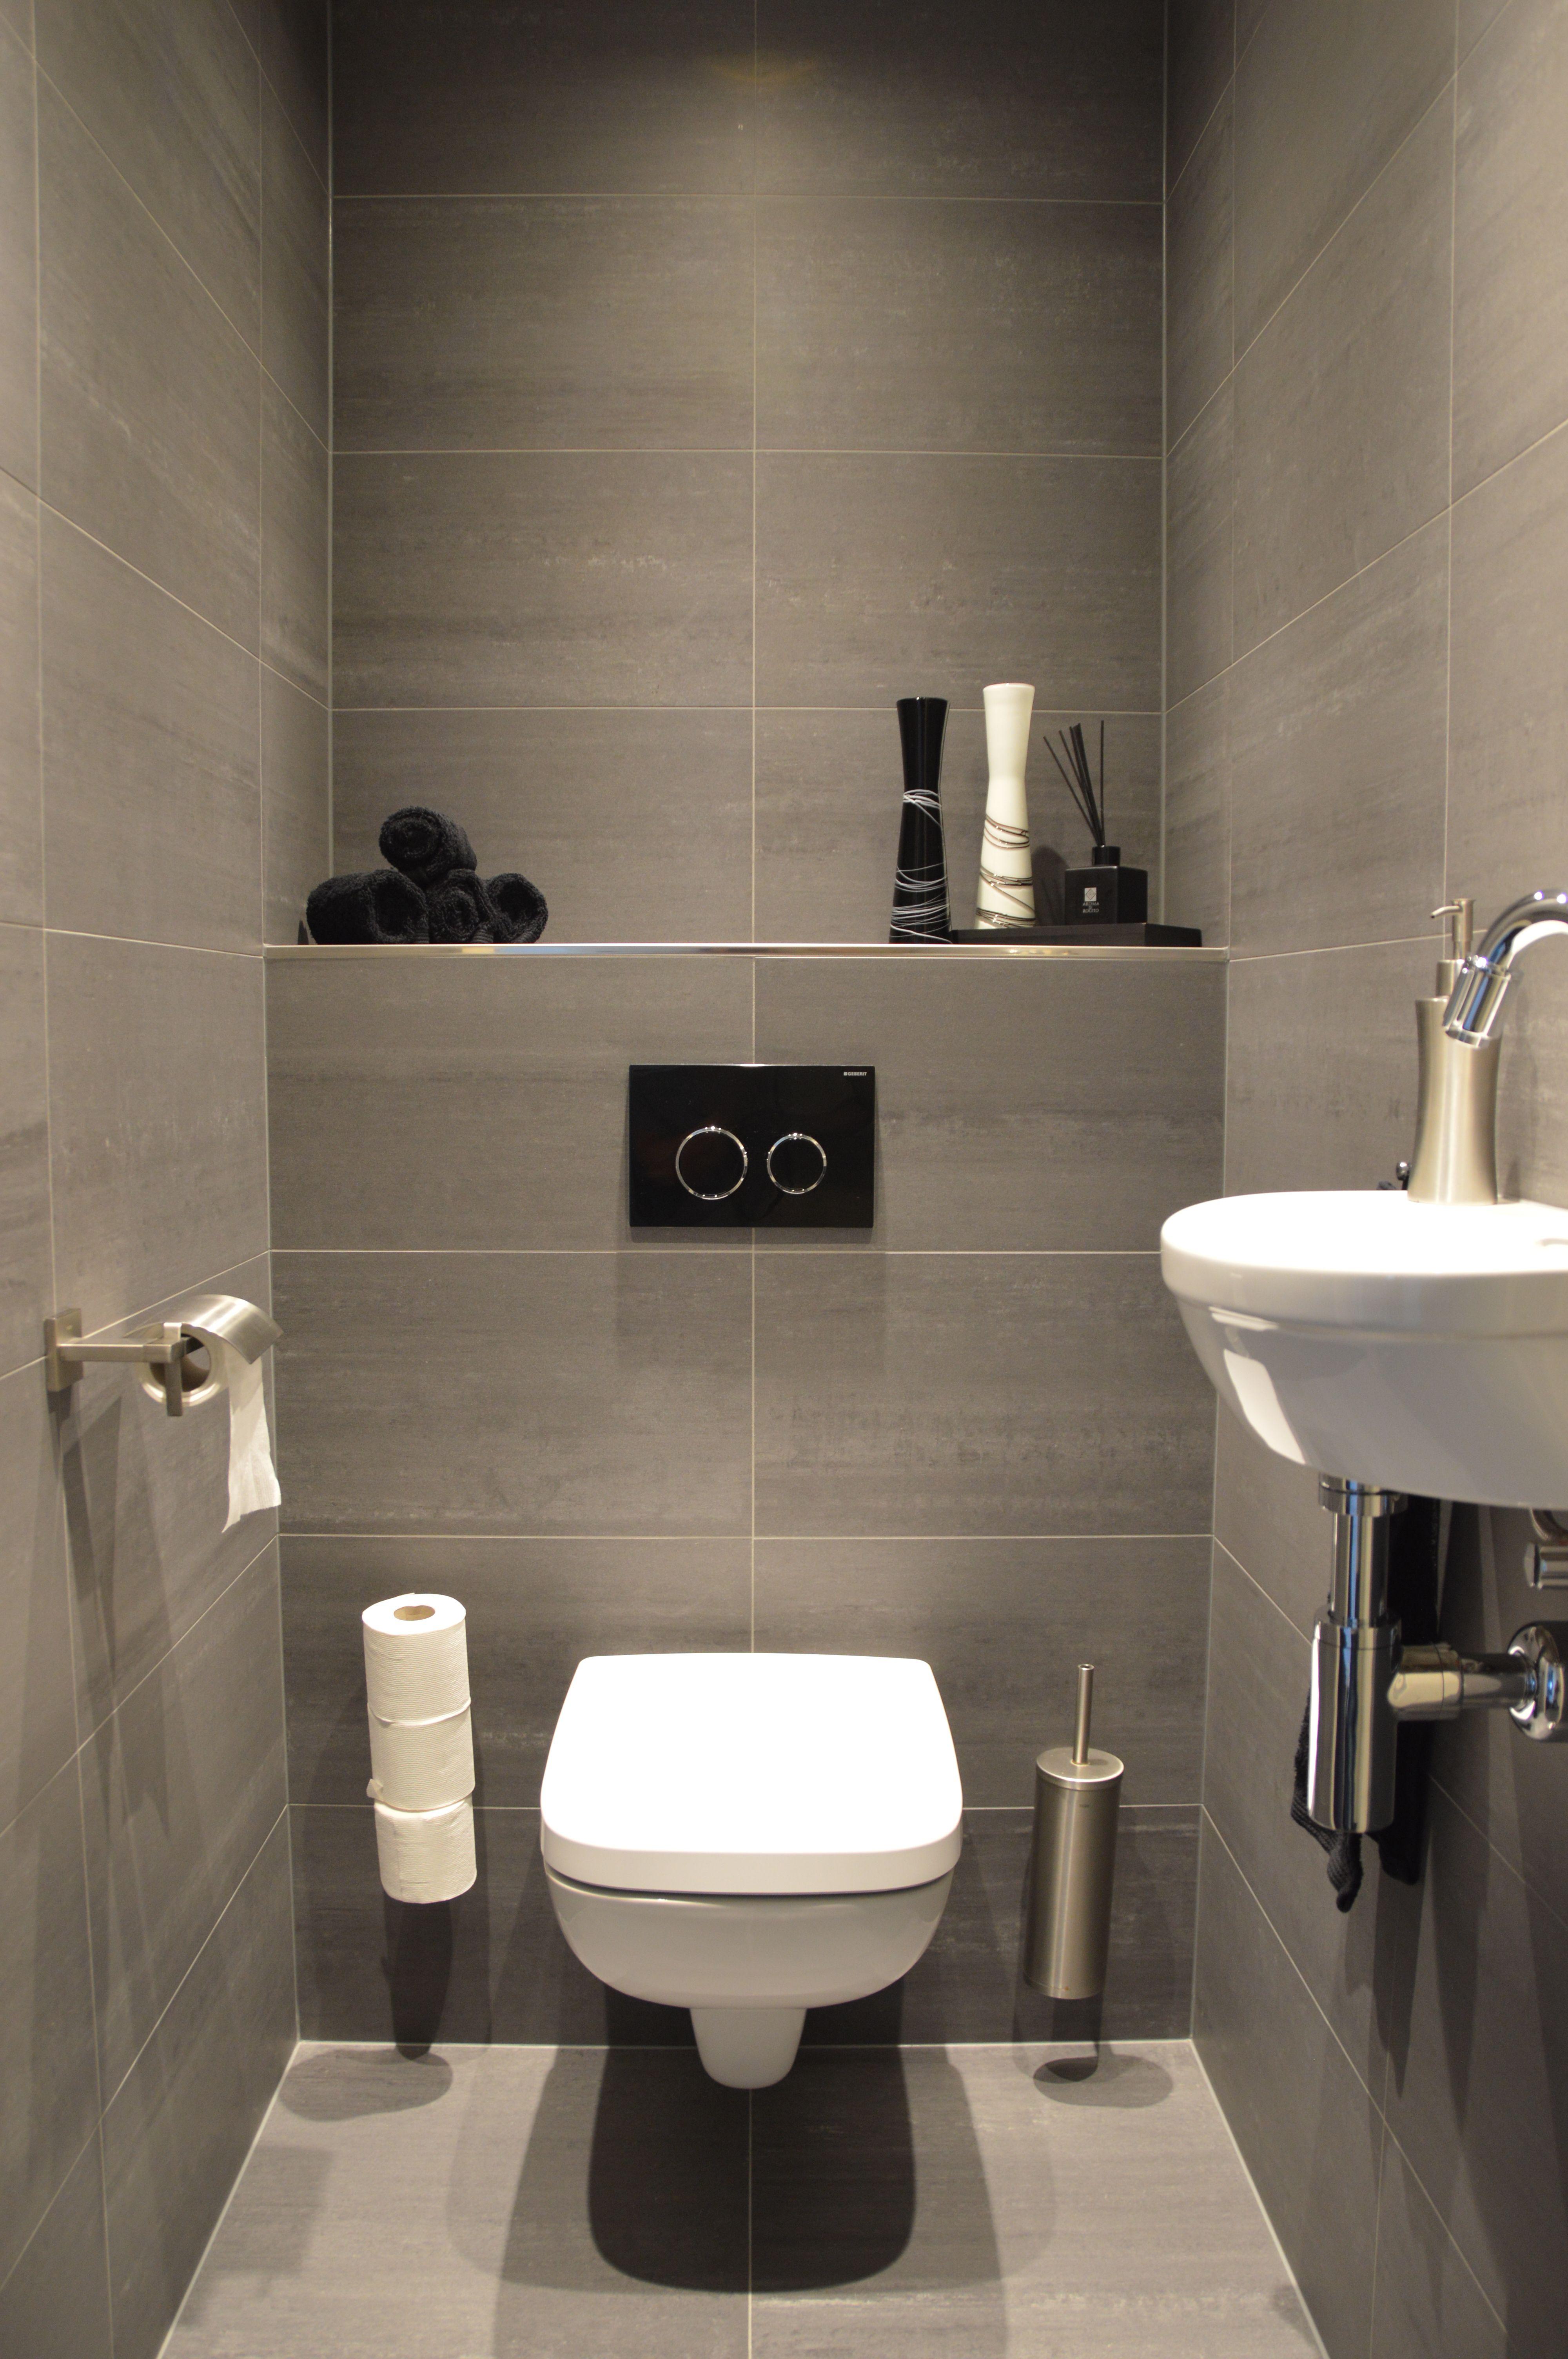 carrelage mural toilettes sunnda espagnol 200x600mm toilette douche carrelage mural buy. Black Bedroom Furniture Sets. Home Design Ideas